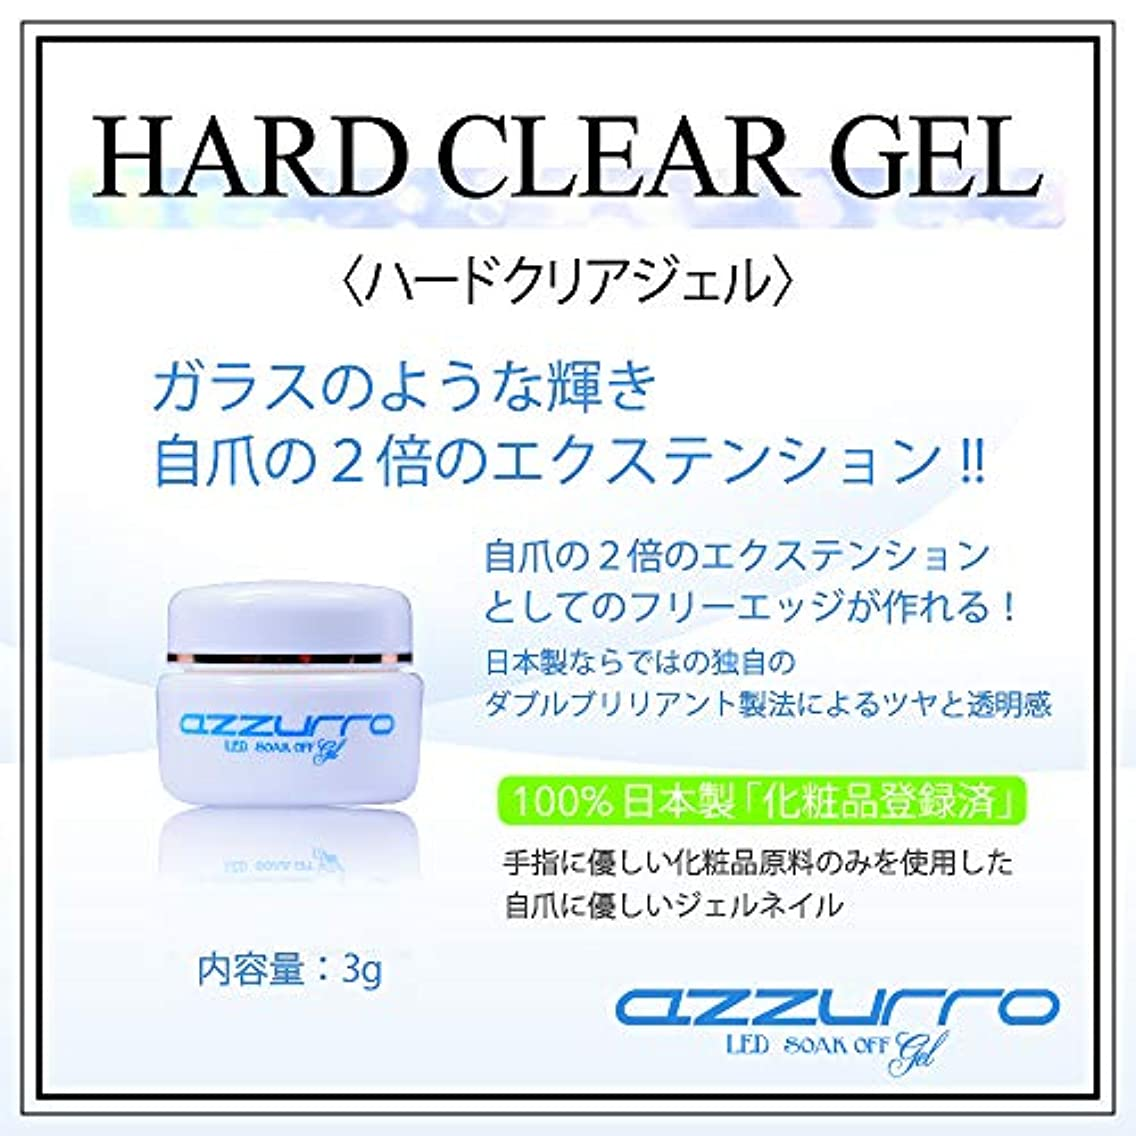 azzurro gel アッズーロハードクリアージェル 3g ツヤツヤ キラキラ感持続 抜群のツヤ